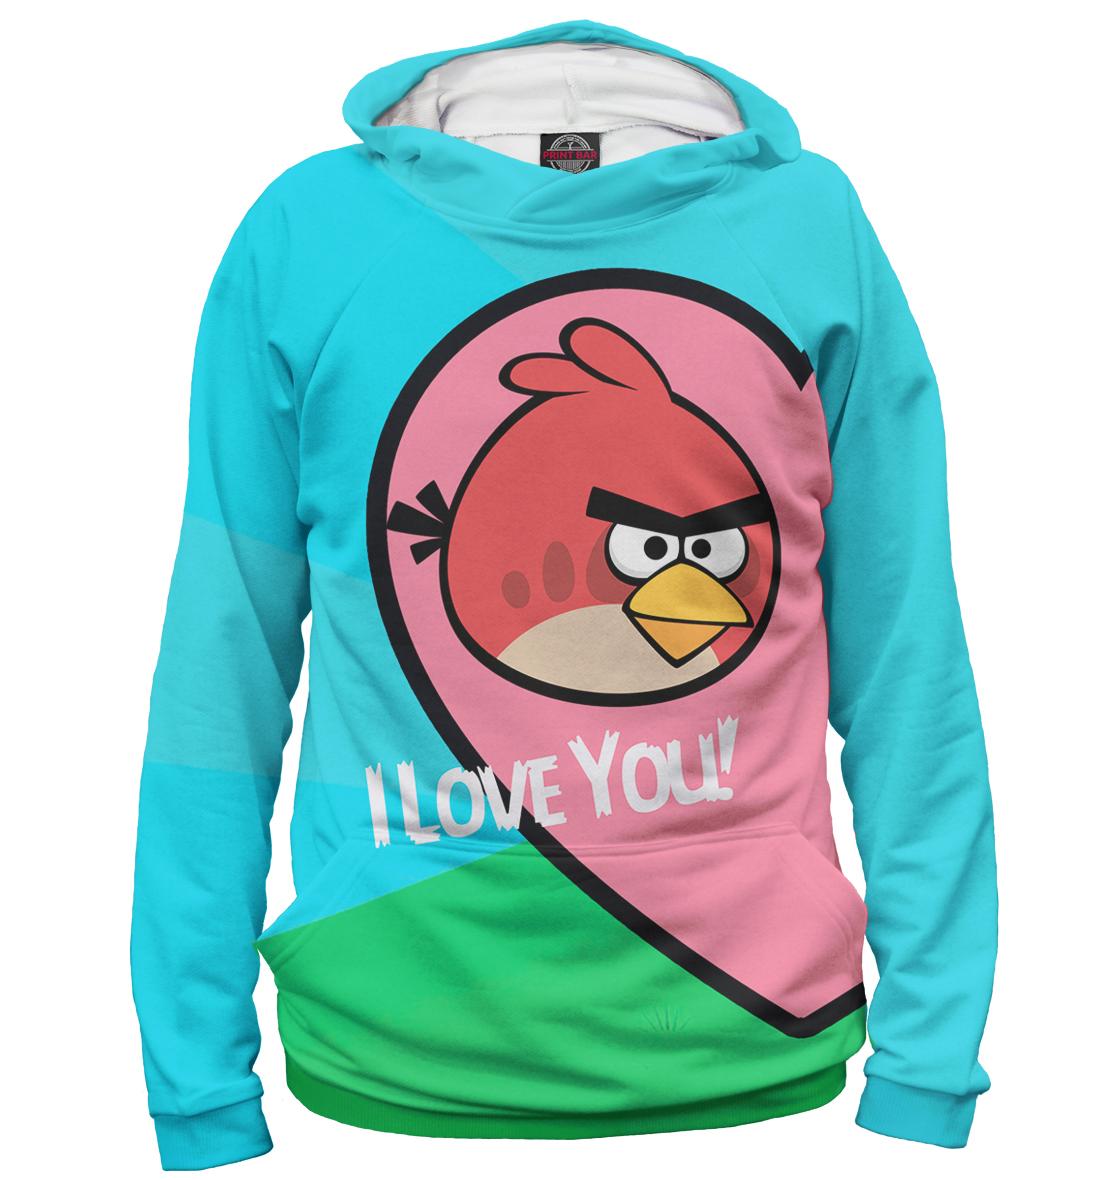 Купить Angry Birds in love, Printbar, Худи, 14F-315750-hud-2